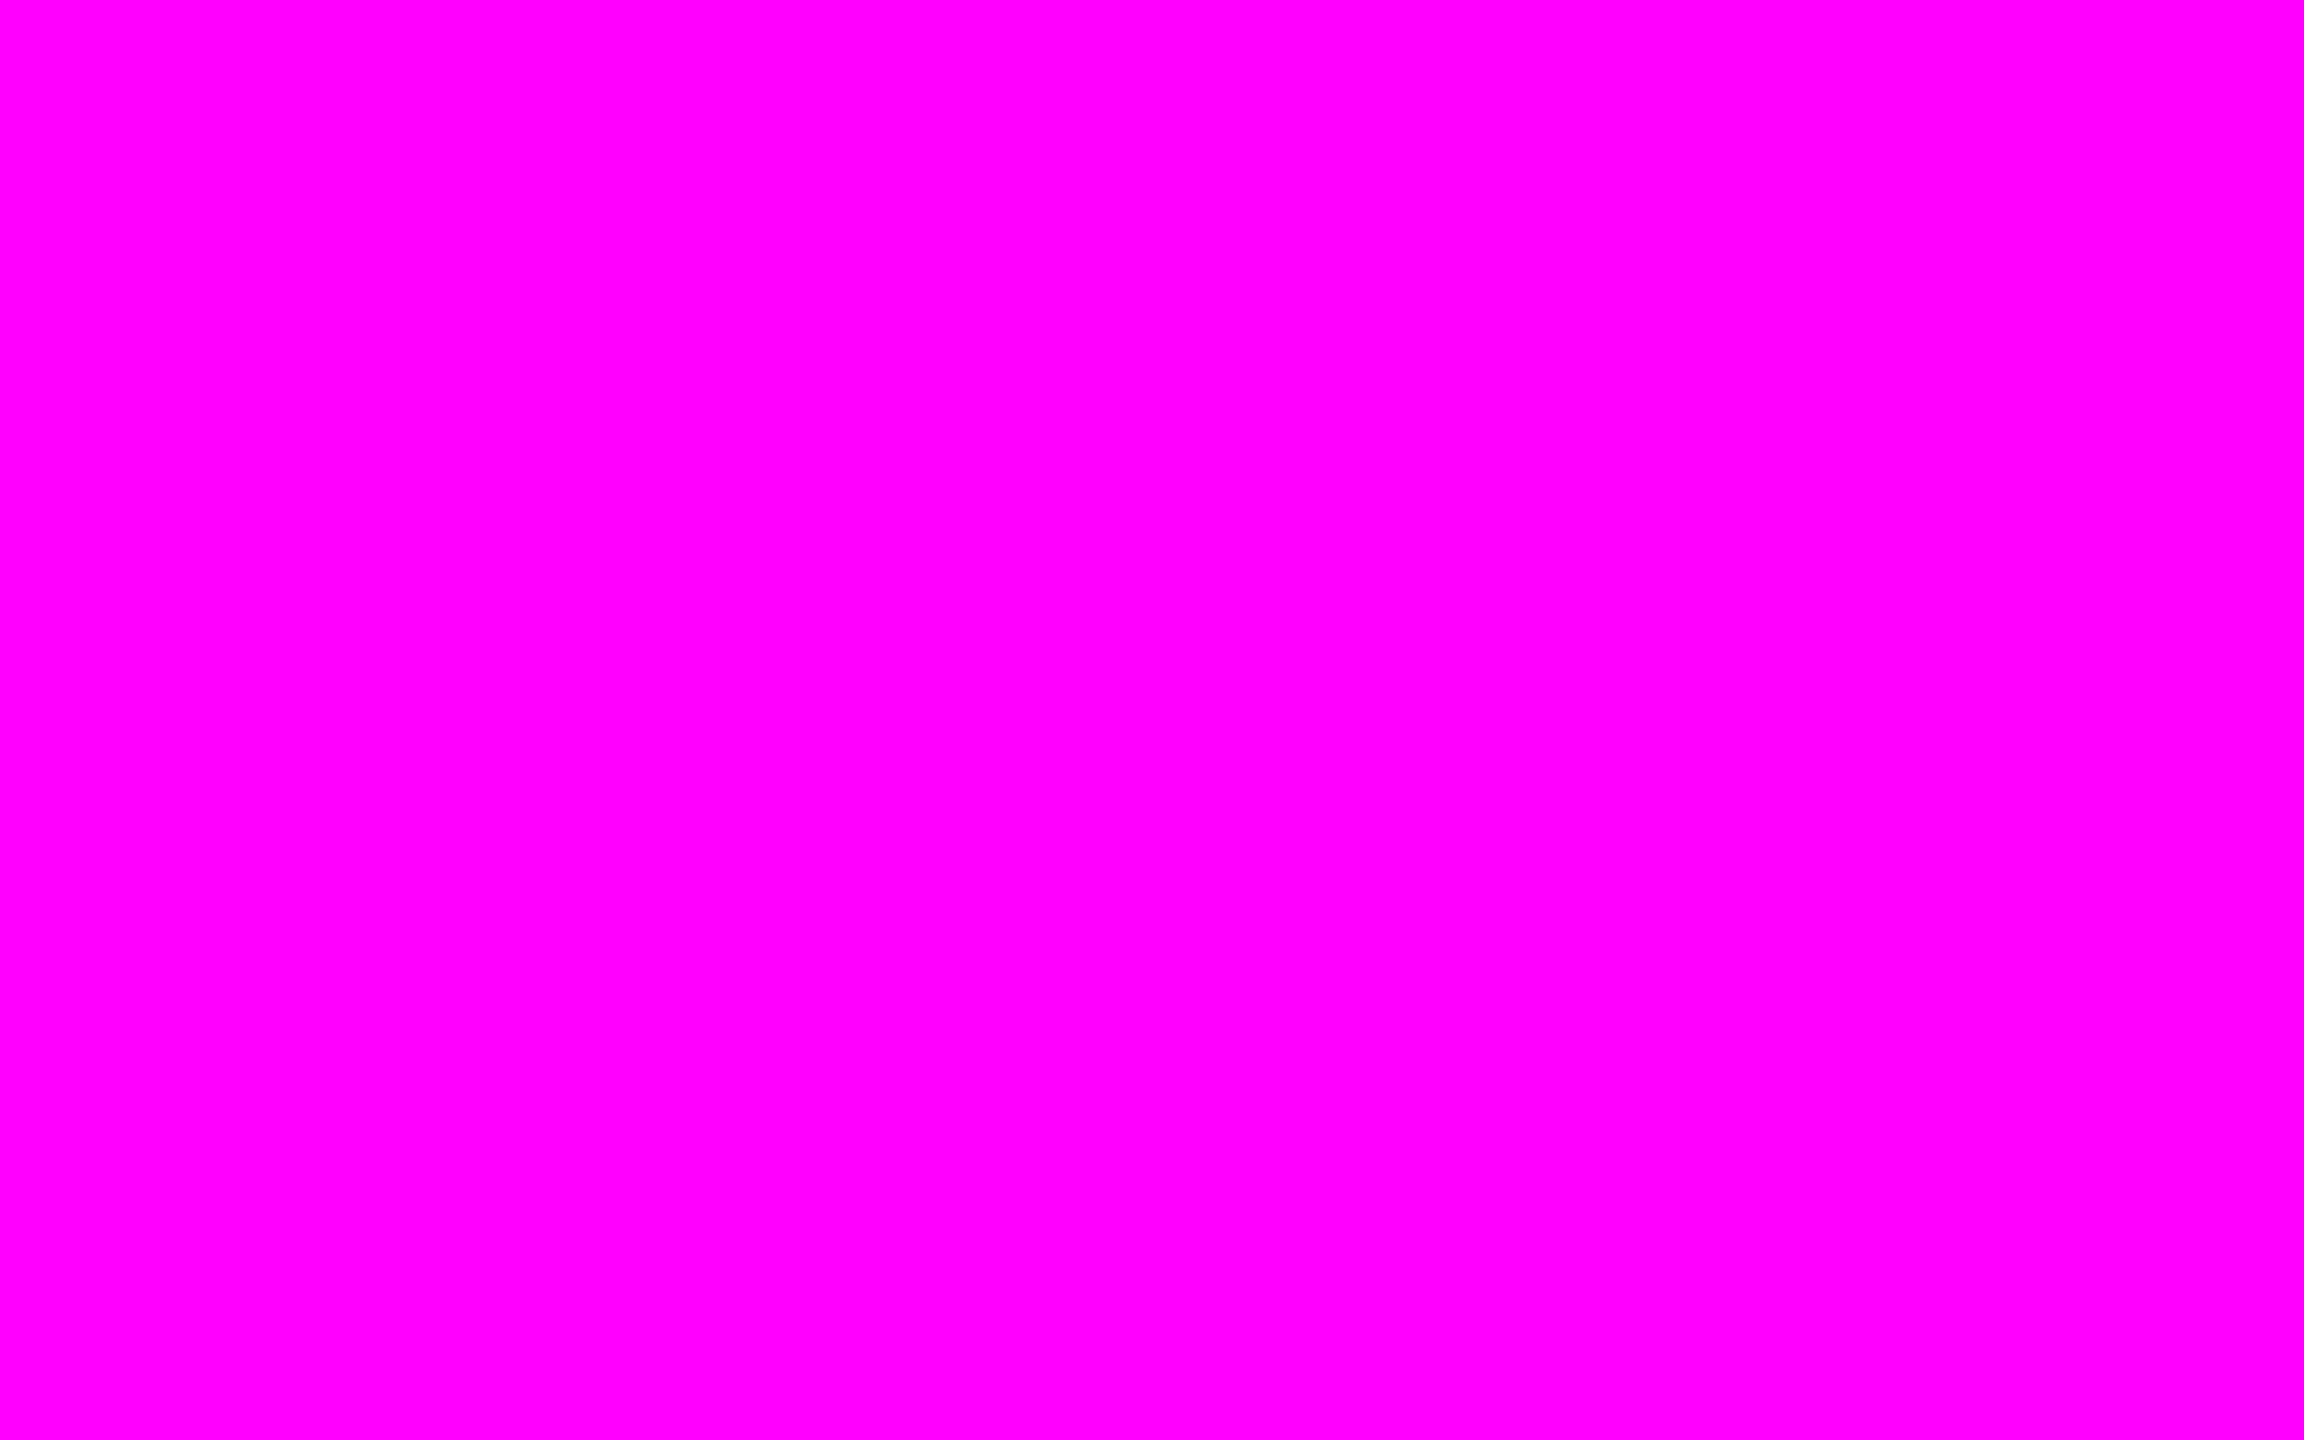 2304x1440 Fuchsia Solid Color Background